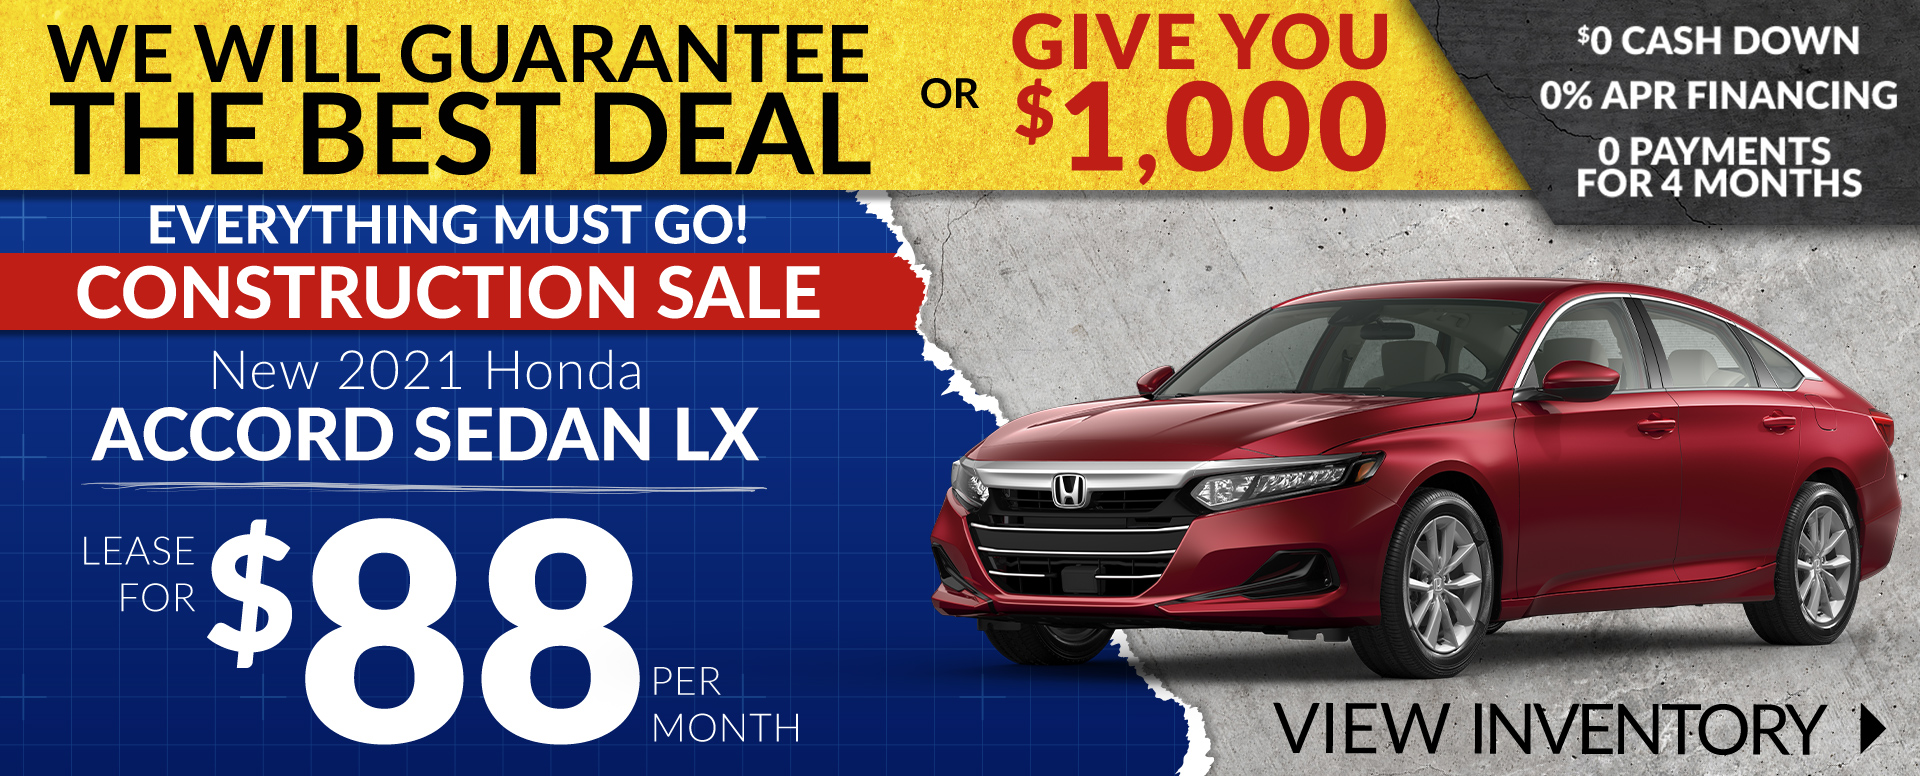 Honda Accord Offer